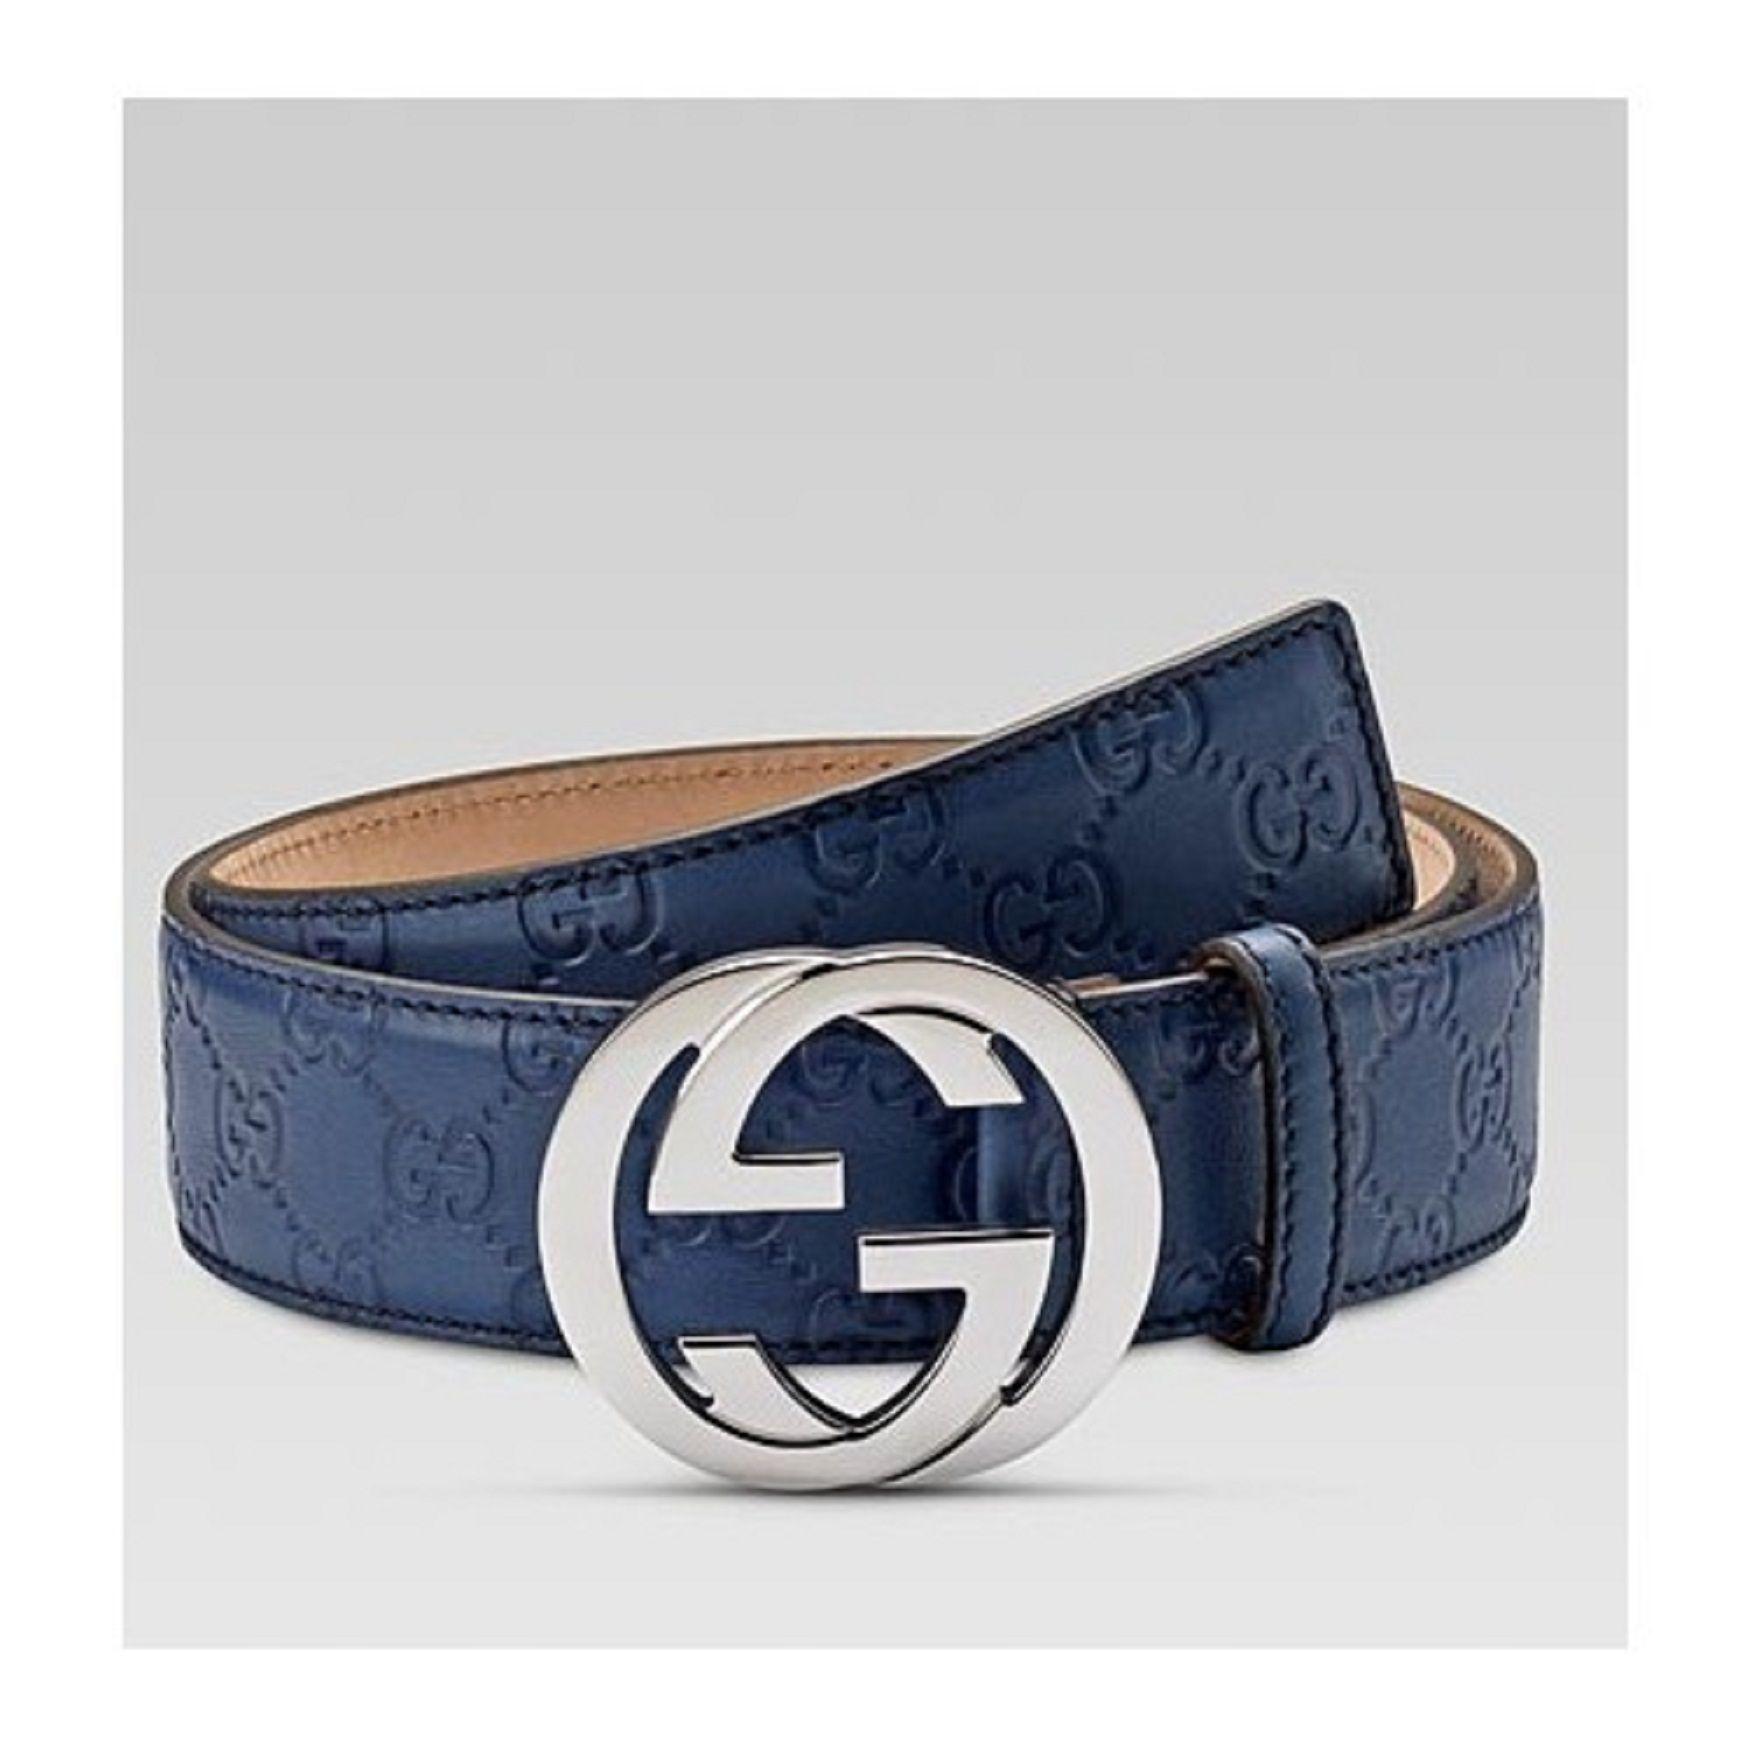 replica bottega veneta handbags wallet belt number